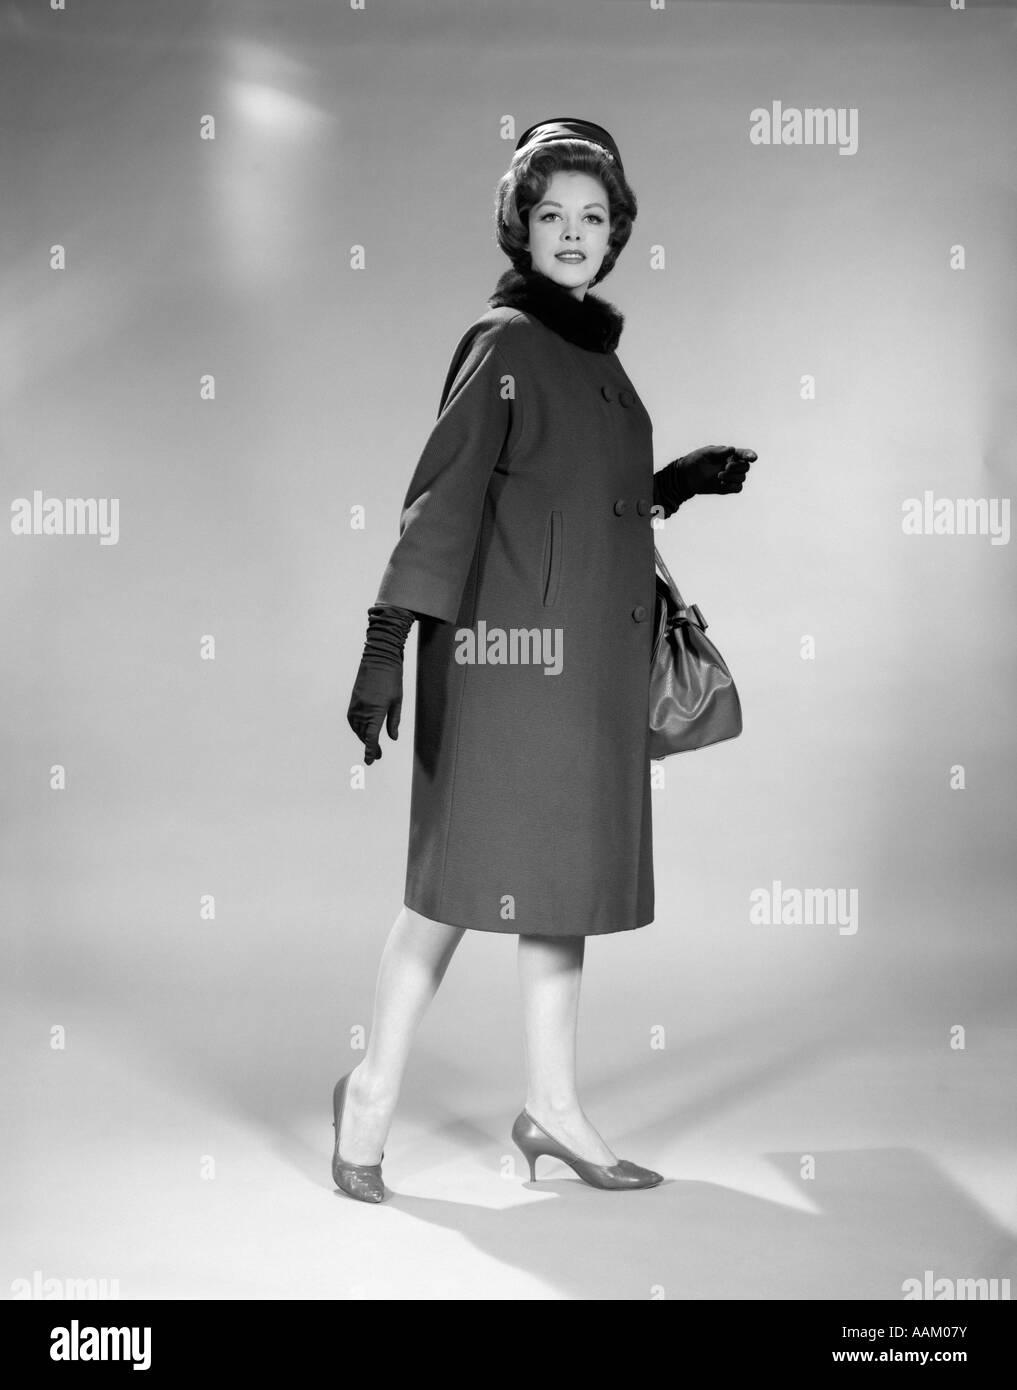 1960s WOMAN FULL LENGTH PILLBOX HAT COAT GLOVES FUR COLLAR HIGH HEELED SHOES HANDBAG STUDIO PORTRAIT LOOKING AT CAMERA  sc 1 st  Alamy & 1960s WOMAN FULL LENGTH PILLBOX HAT COAT GLOVES FUR COLLAR HIGH ... Aboutintivar.Com